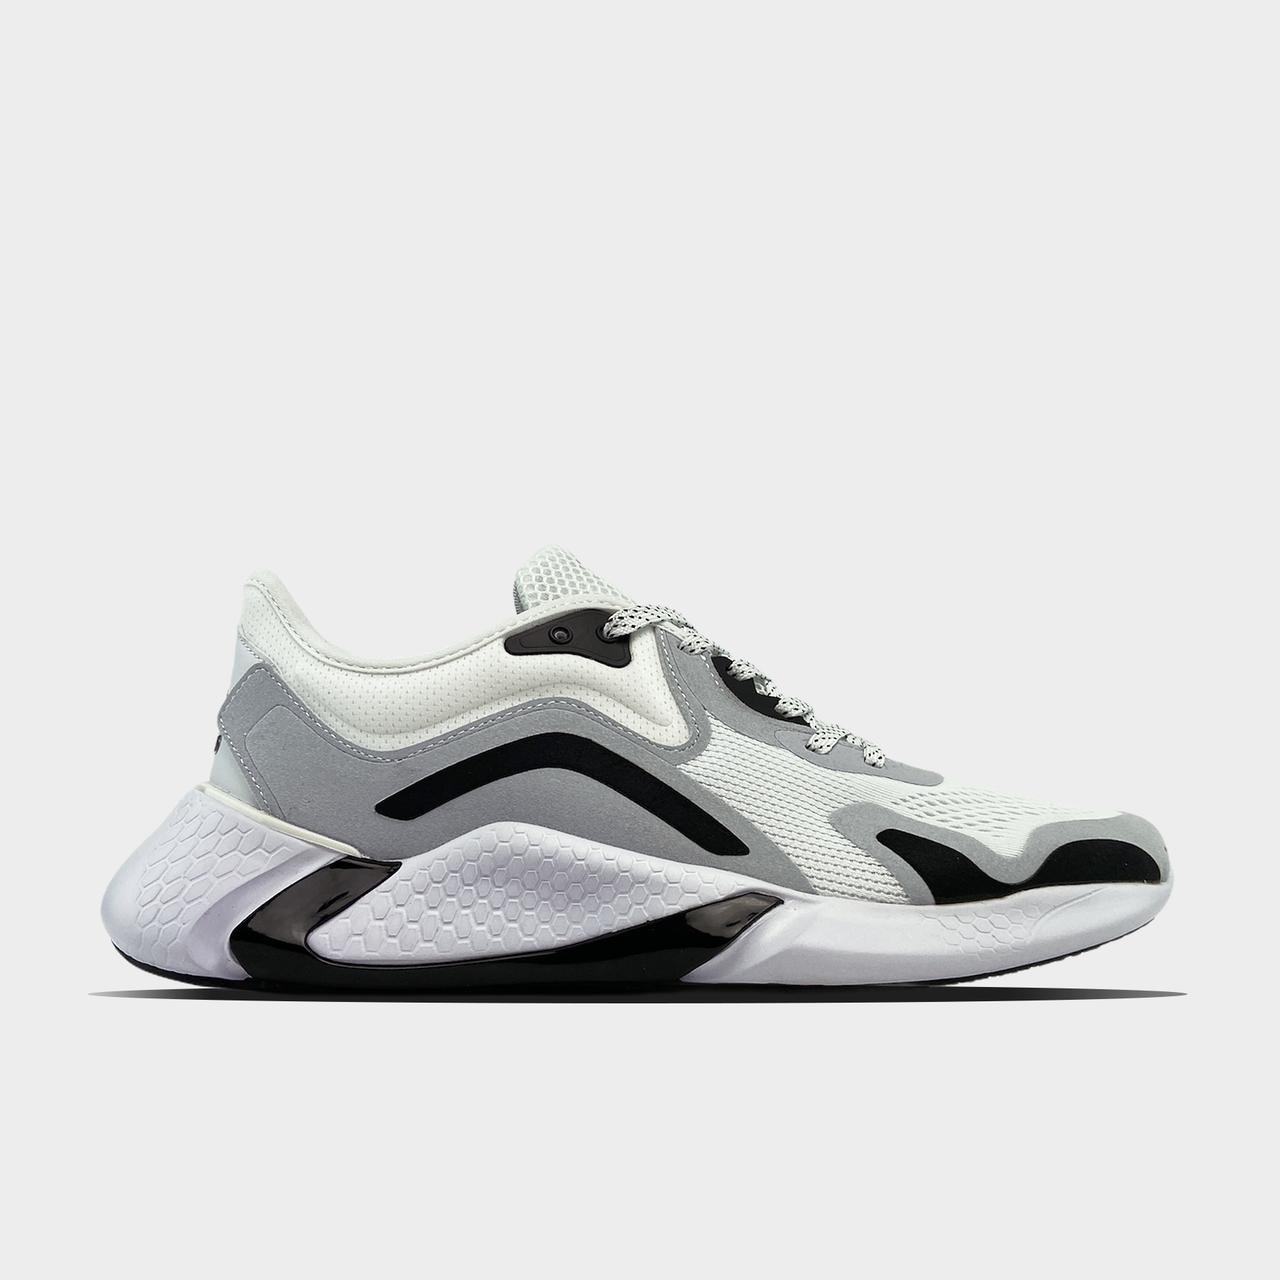 Ad!id@s, крос, обувь, взуття, sneakers, шузы, Alphabounce Instinct White Grey (Белый)